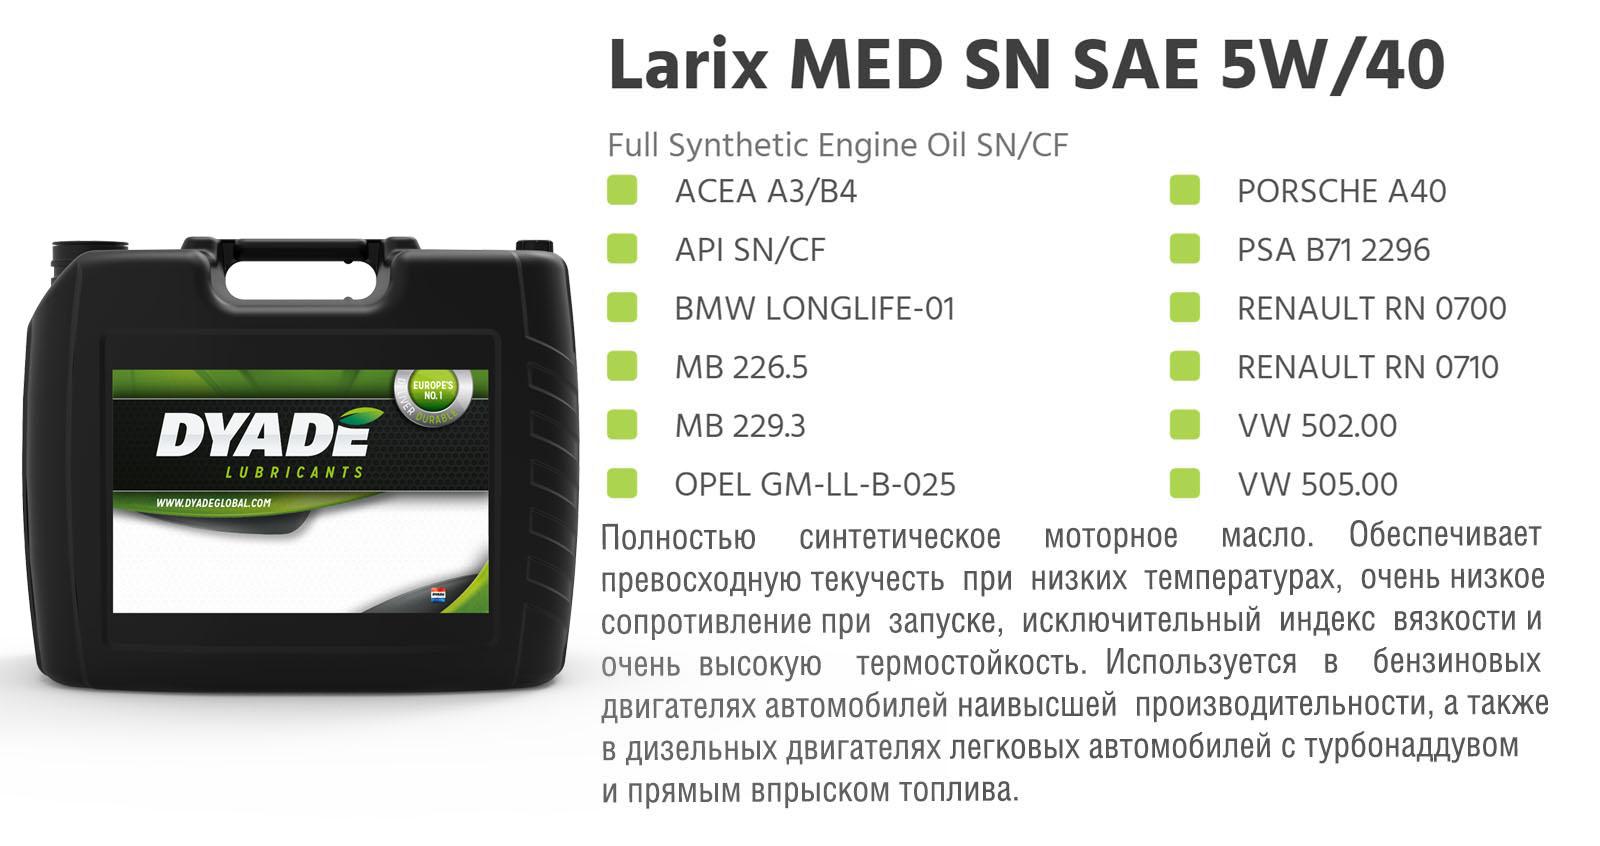 Масло моторное Larix MED SN SAE 5W40 (1L) 573313 dyadelubricants